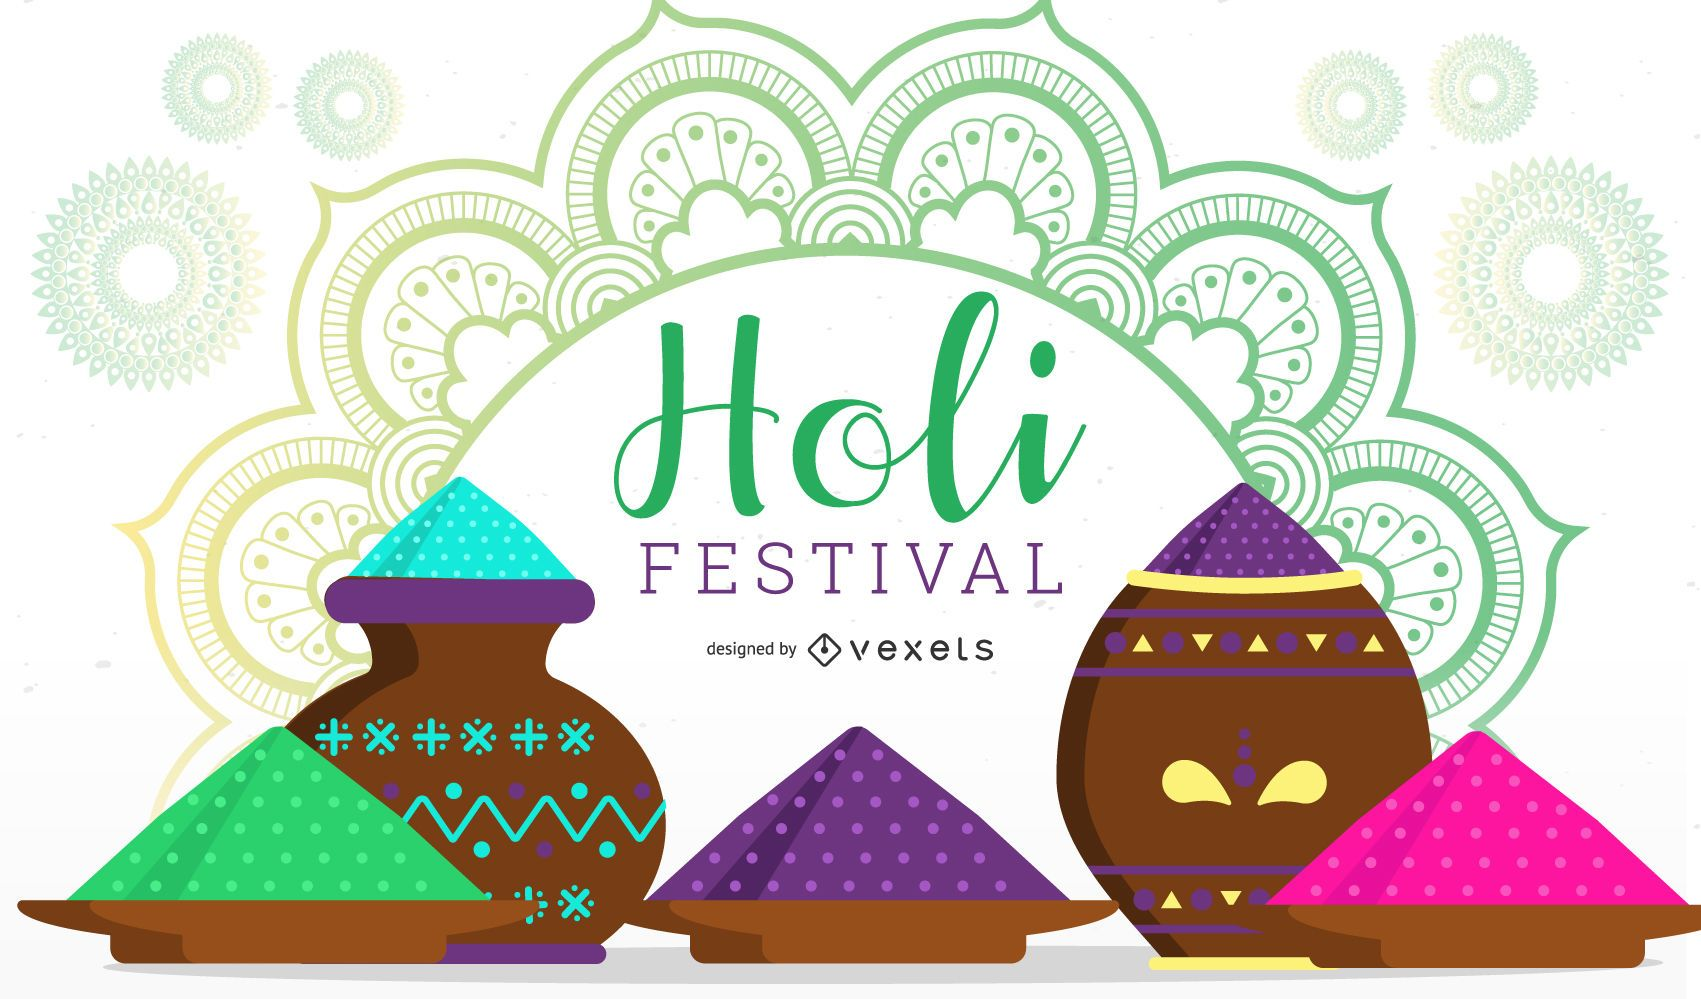 Holi Festival Illustration Design